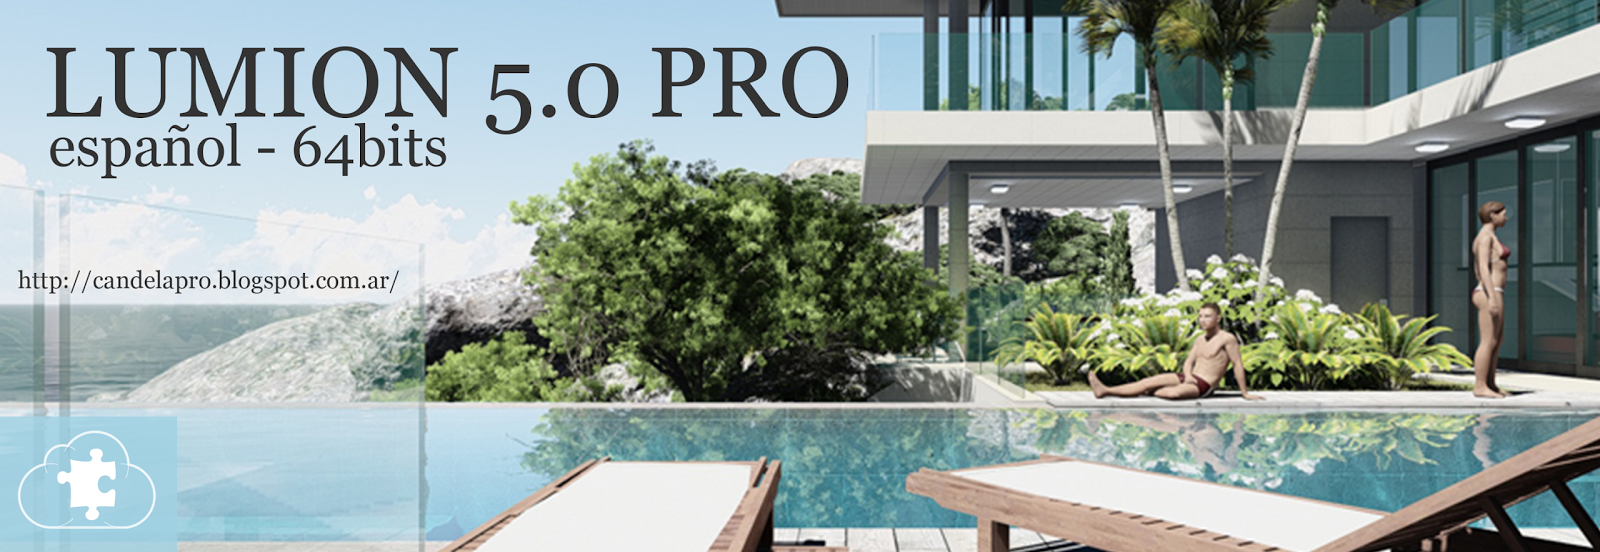 LUMION 5 PRO - español - 64bits